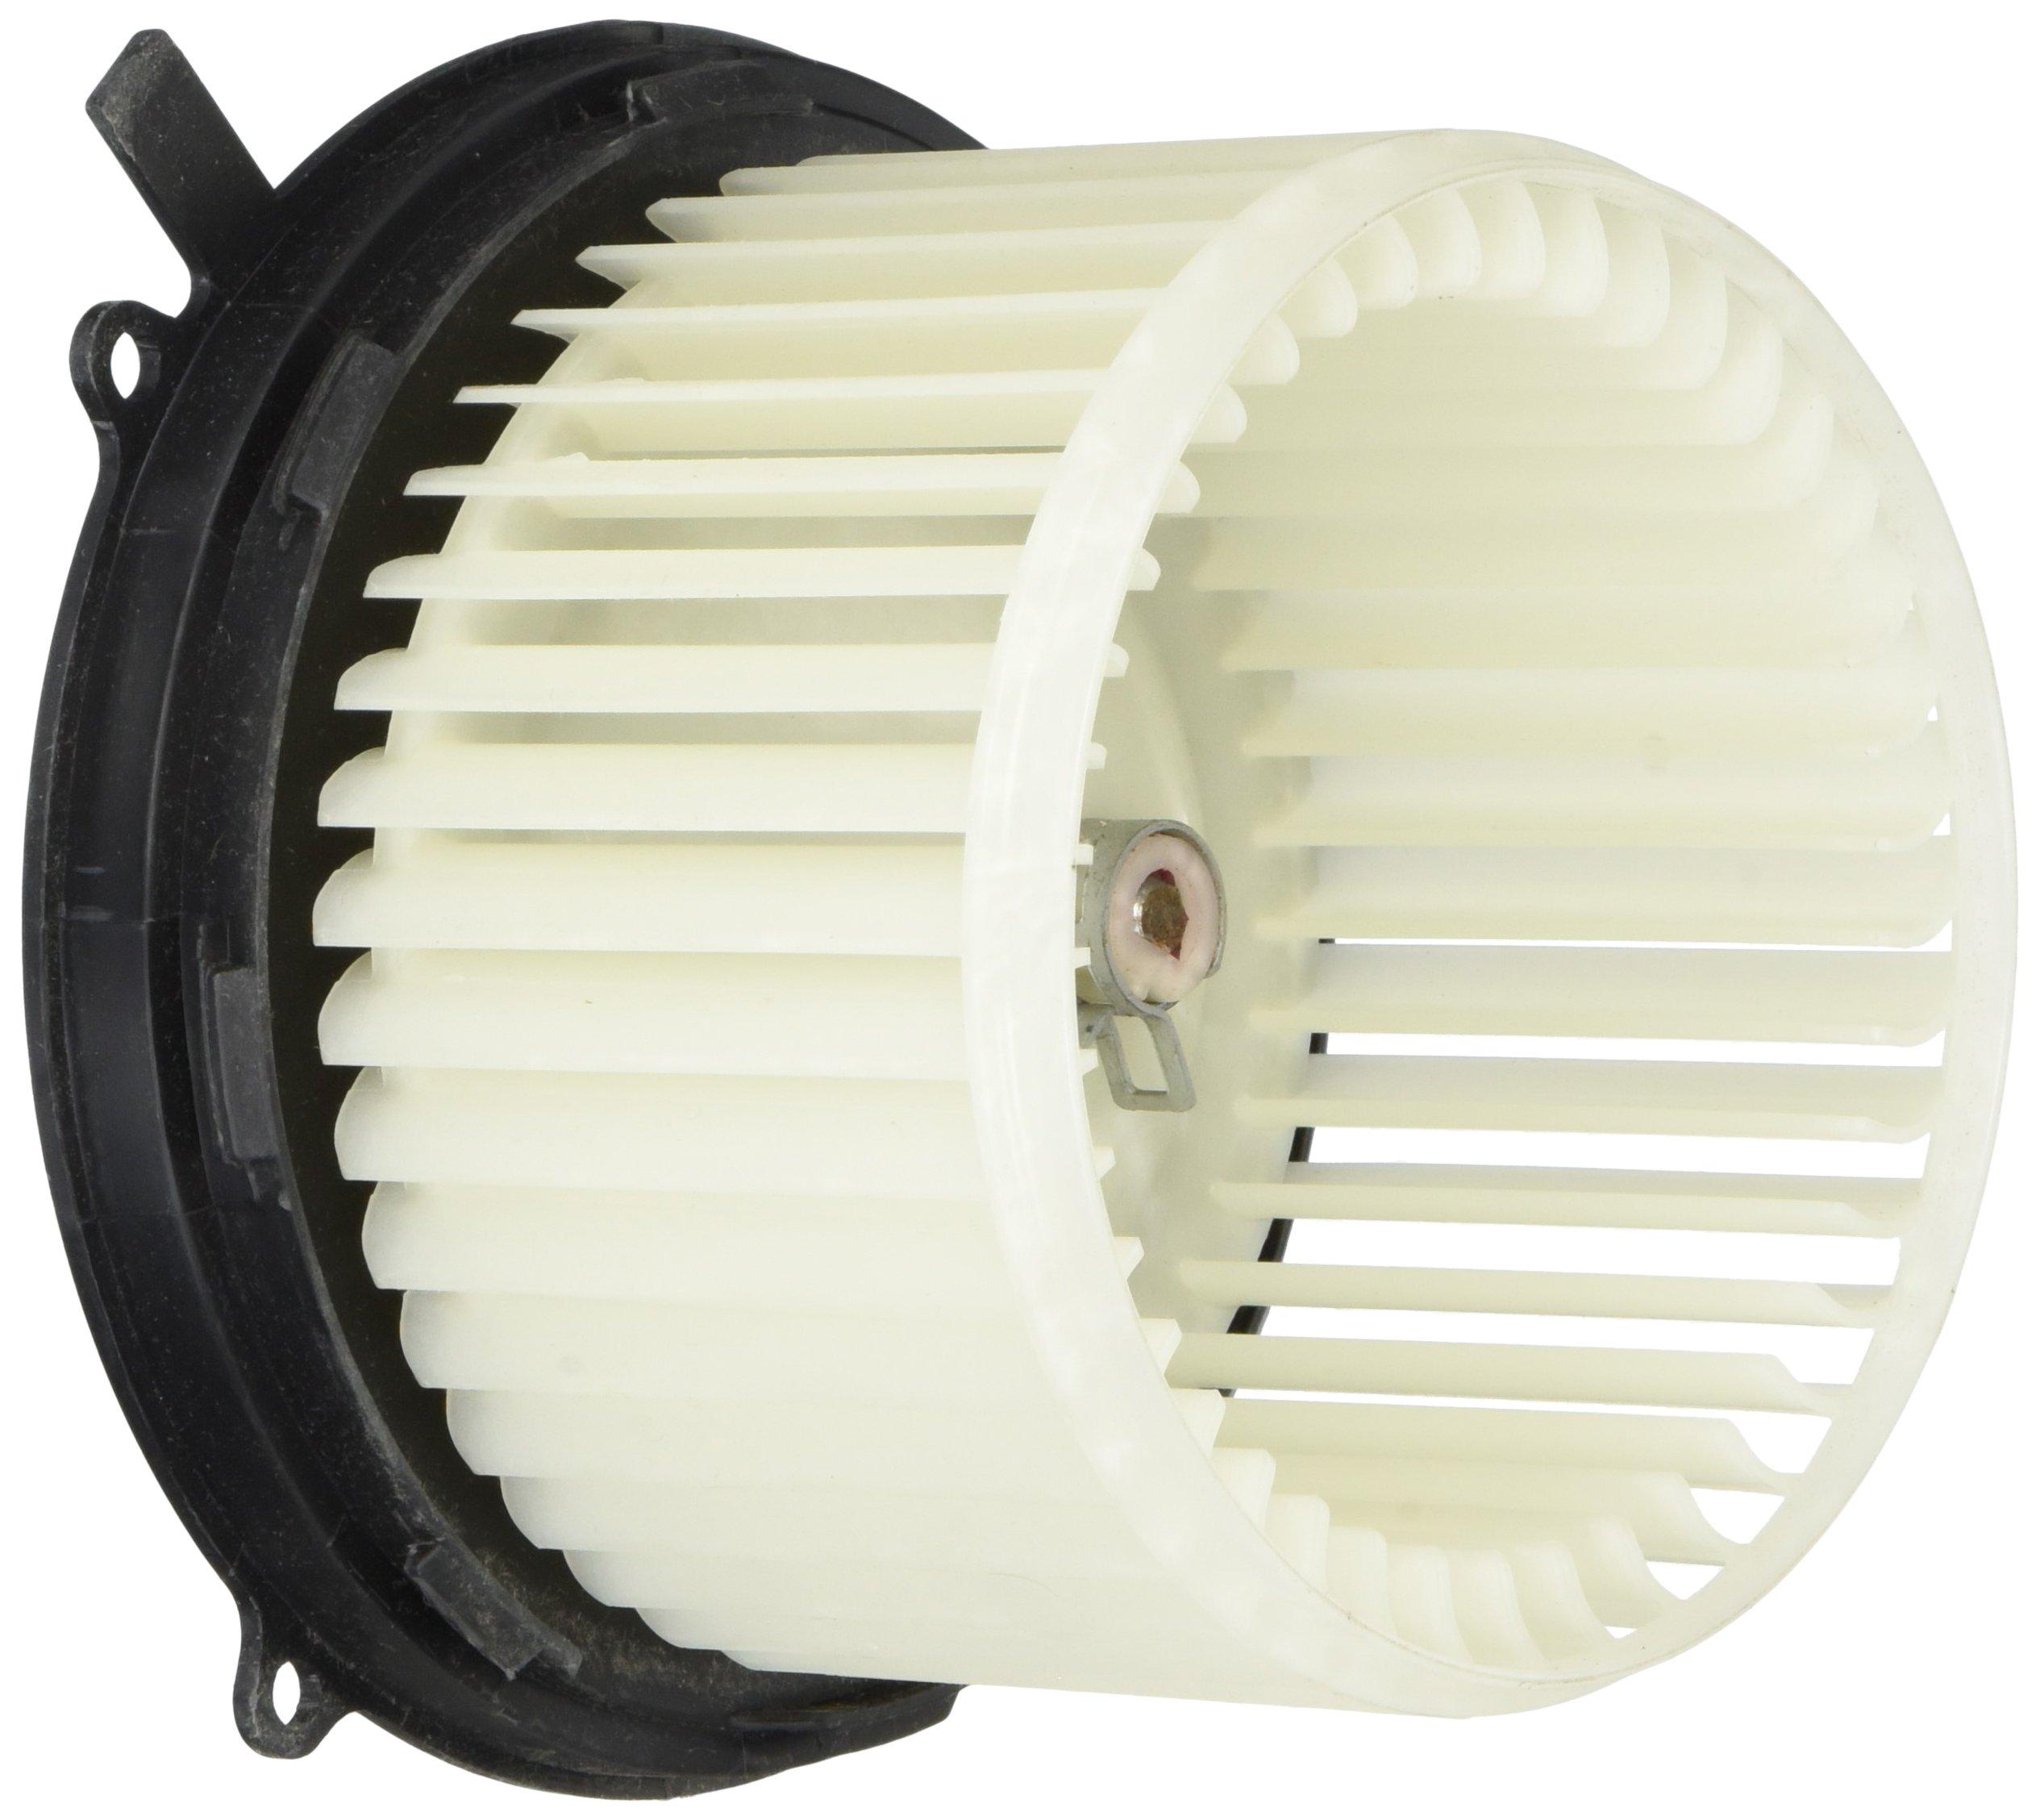 4 Seasons 75847 Blower Motor Assembly by 4 Seasons